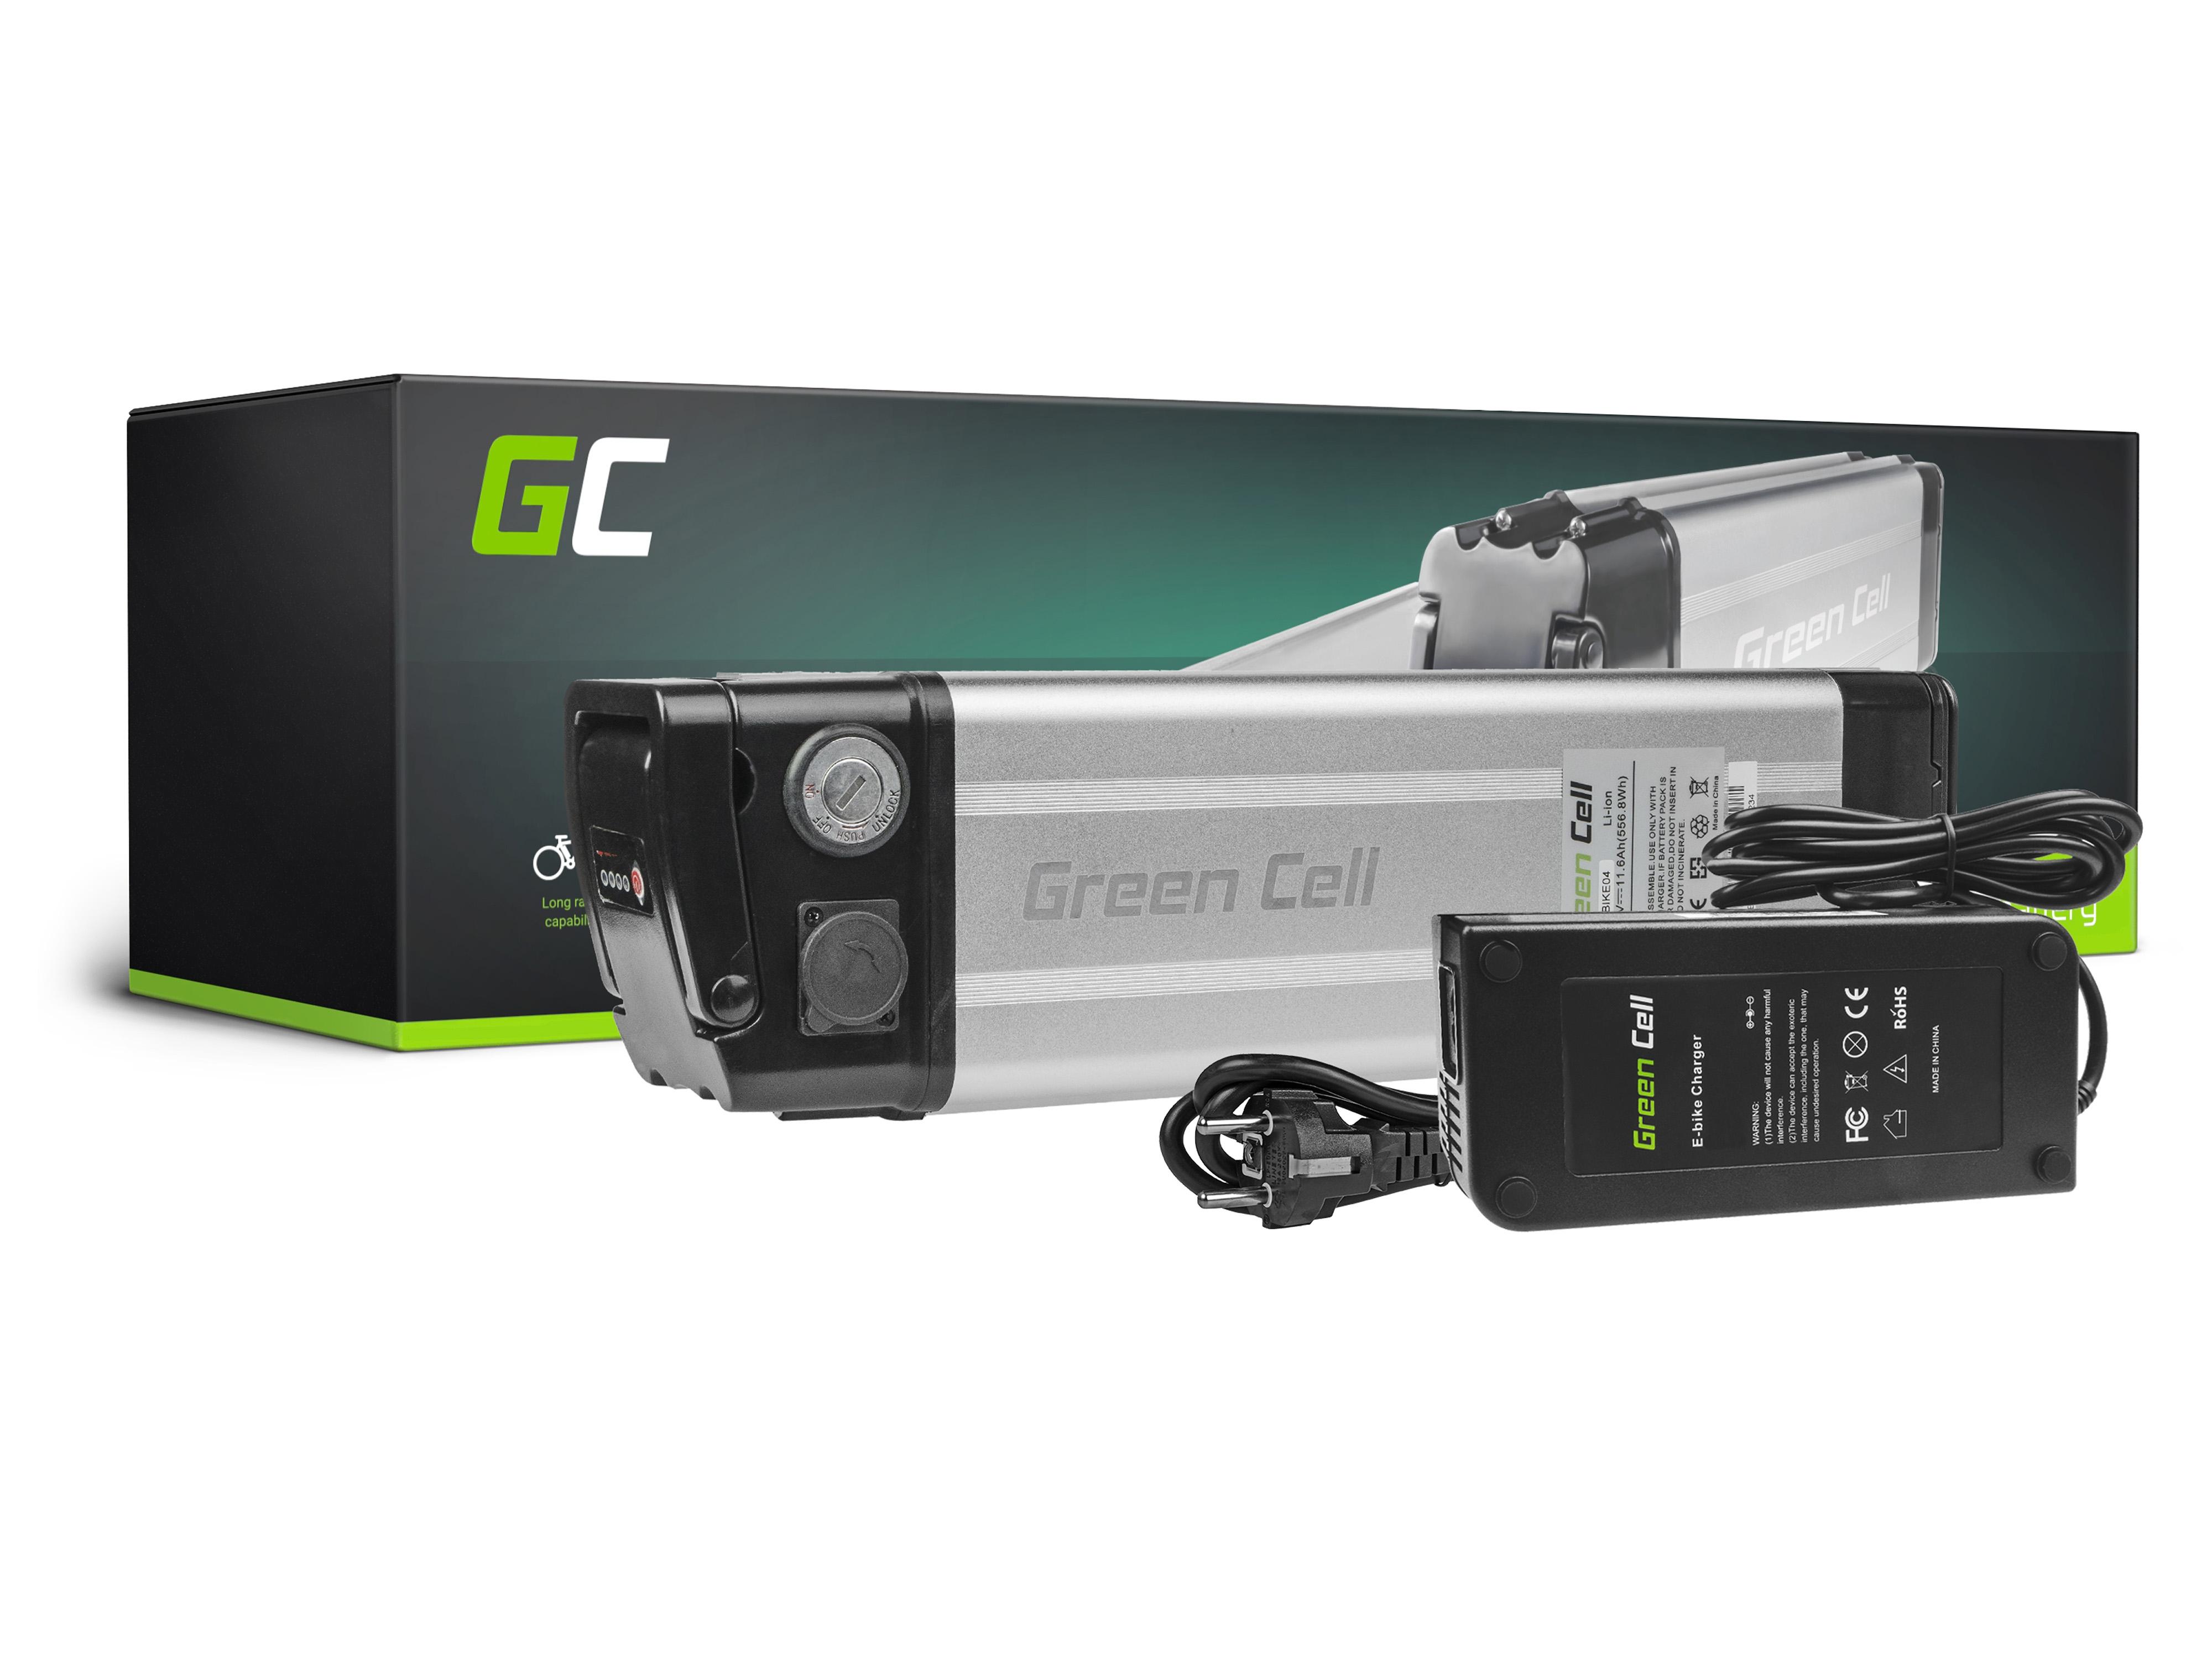 Elektrofahrradteile E-Bike 48V 11.6Ah Batterie Akku Fahrrad Wisper E-Mootika Goplus